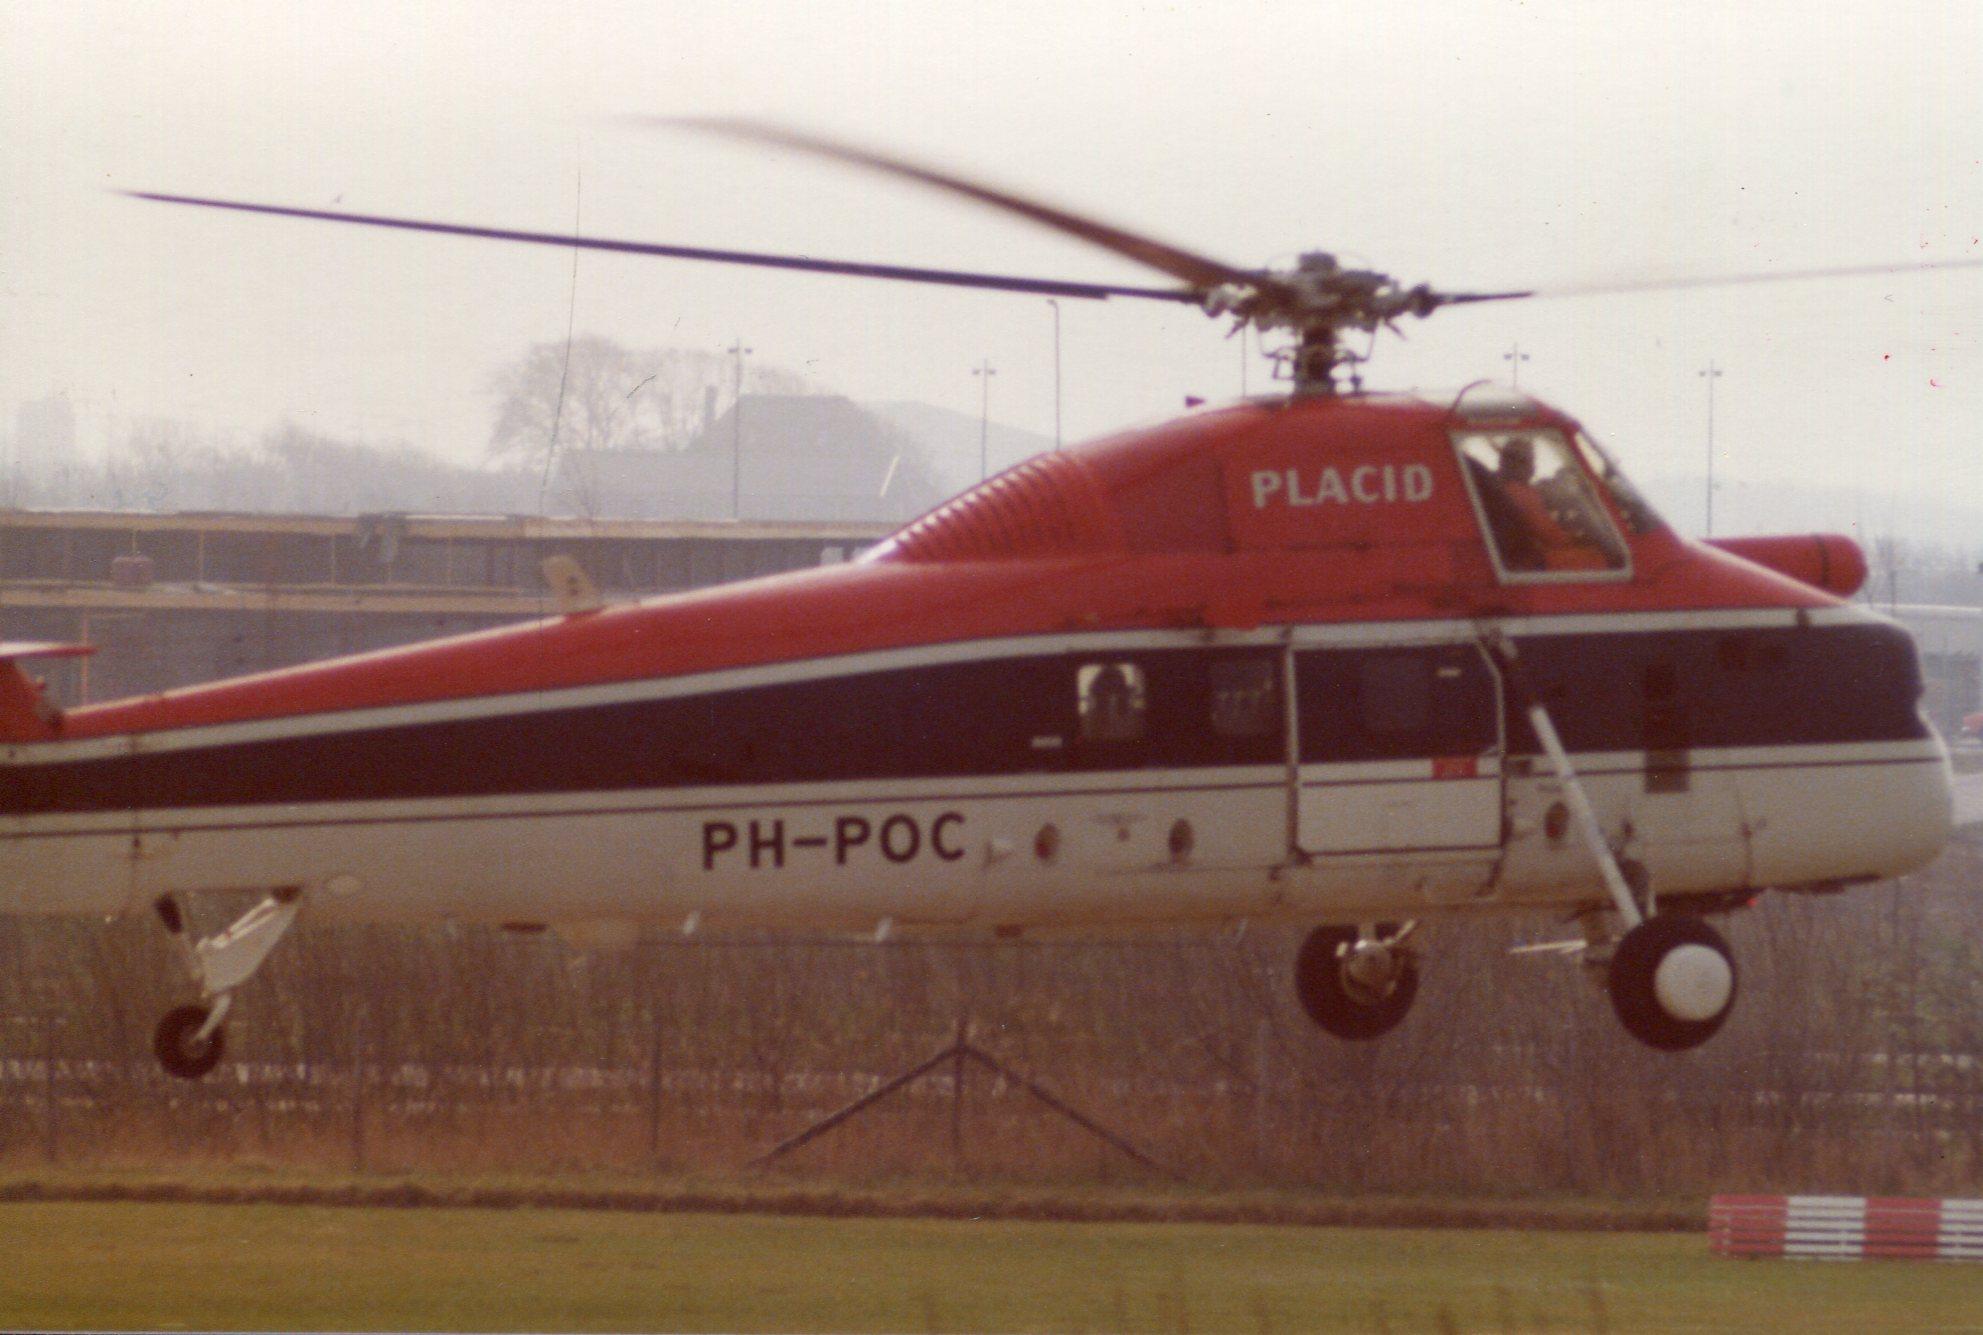 Naam: Den Helder , april 1977.jpg Bekeken: 223 Grootte: 279,4 KB